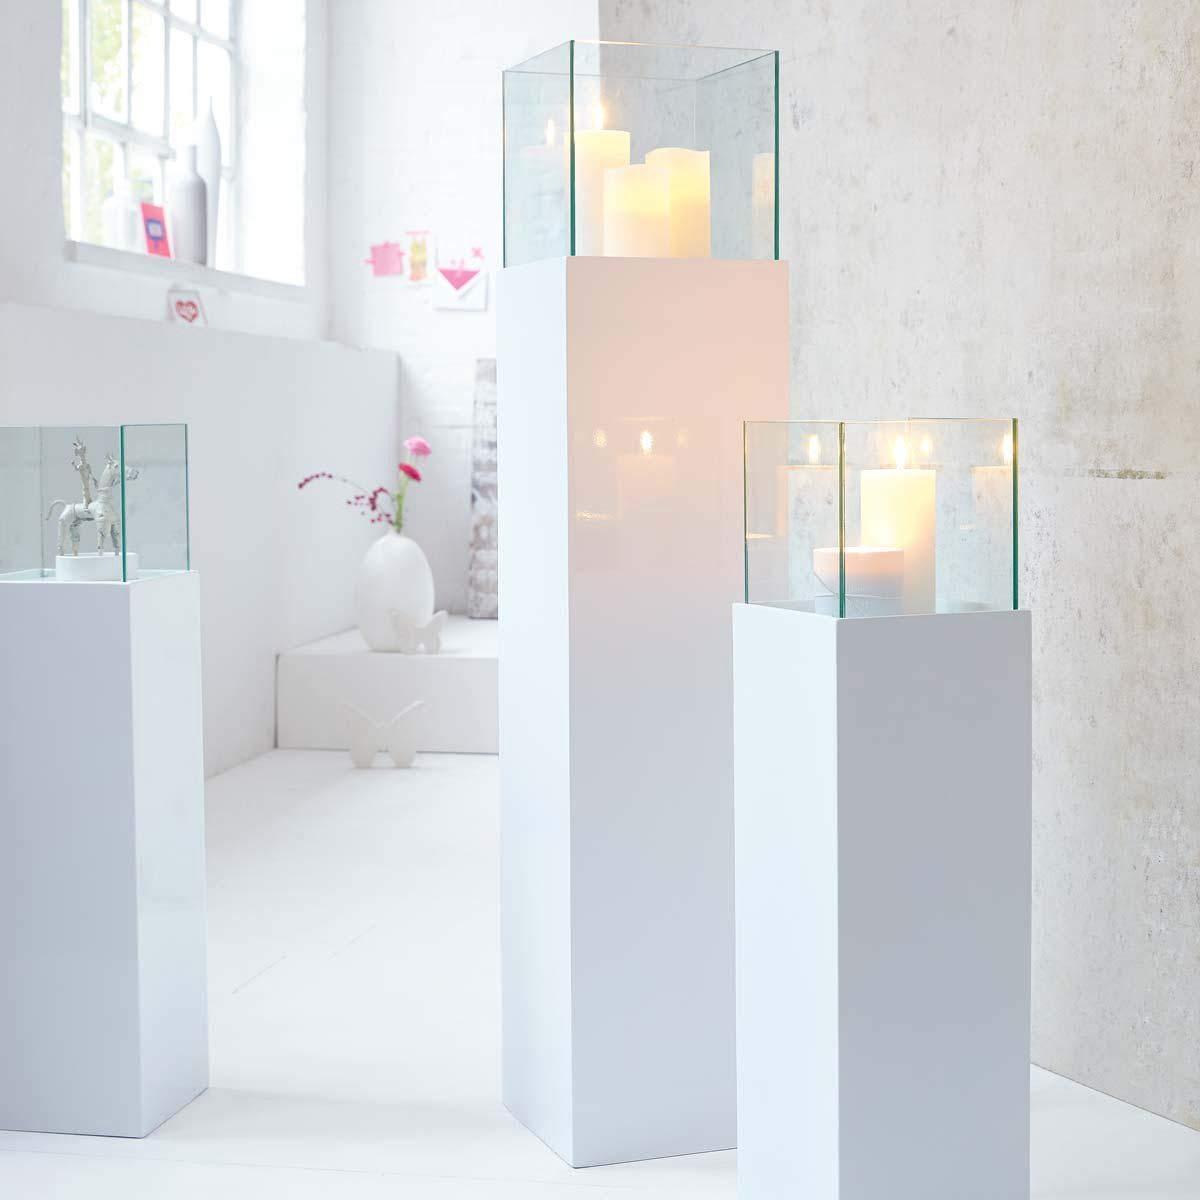 Floor Standing Hurricane Candle Holder Pillar Lantern White High Gloss Finish 20 x 20 x 80 cm PureDay